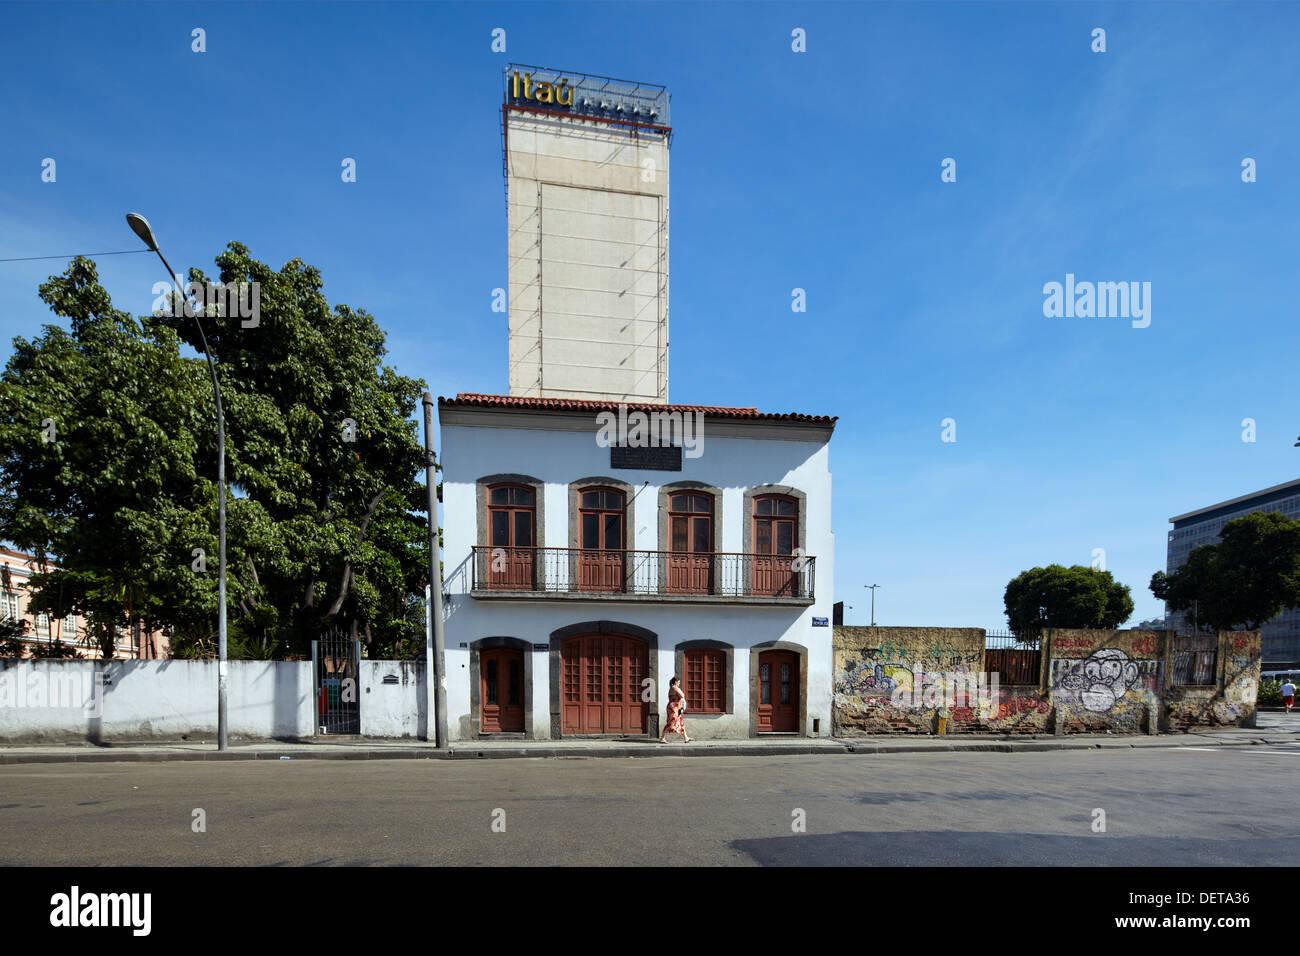 Casa Historica de Deodoro, Rio de Janeiro, Brazil, South America - Stock Image